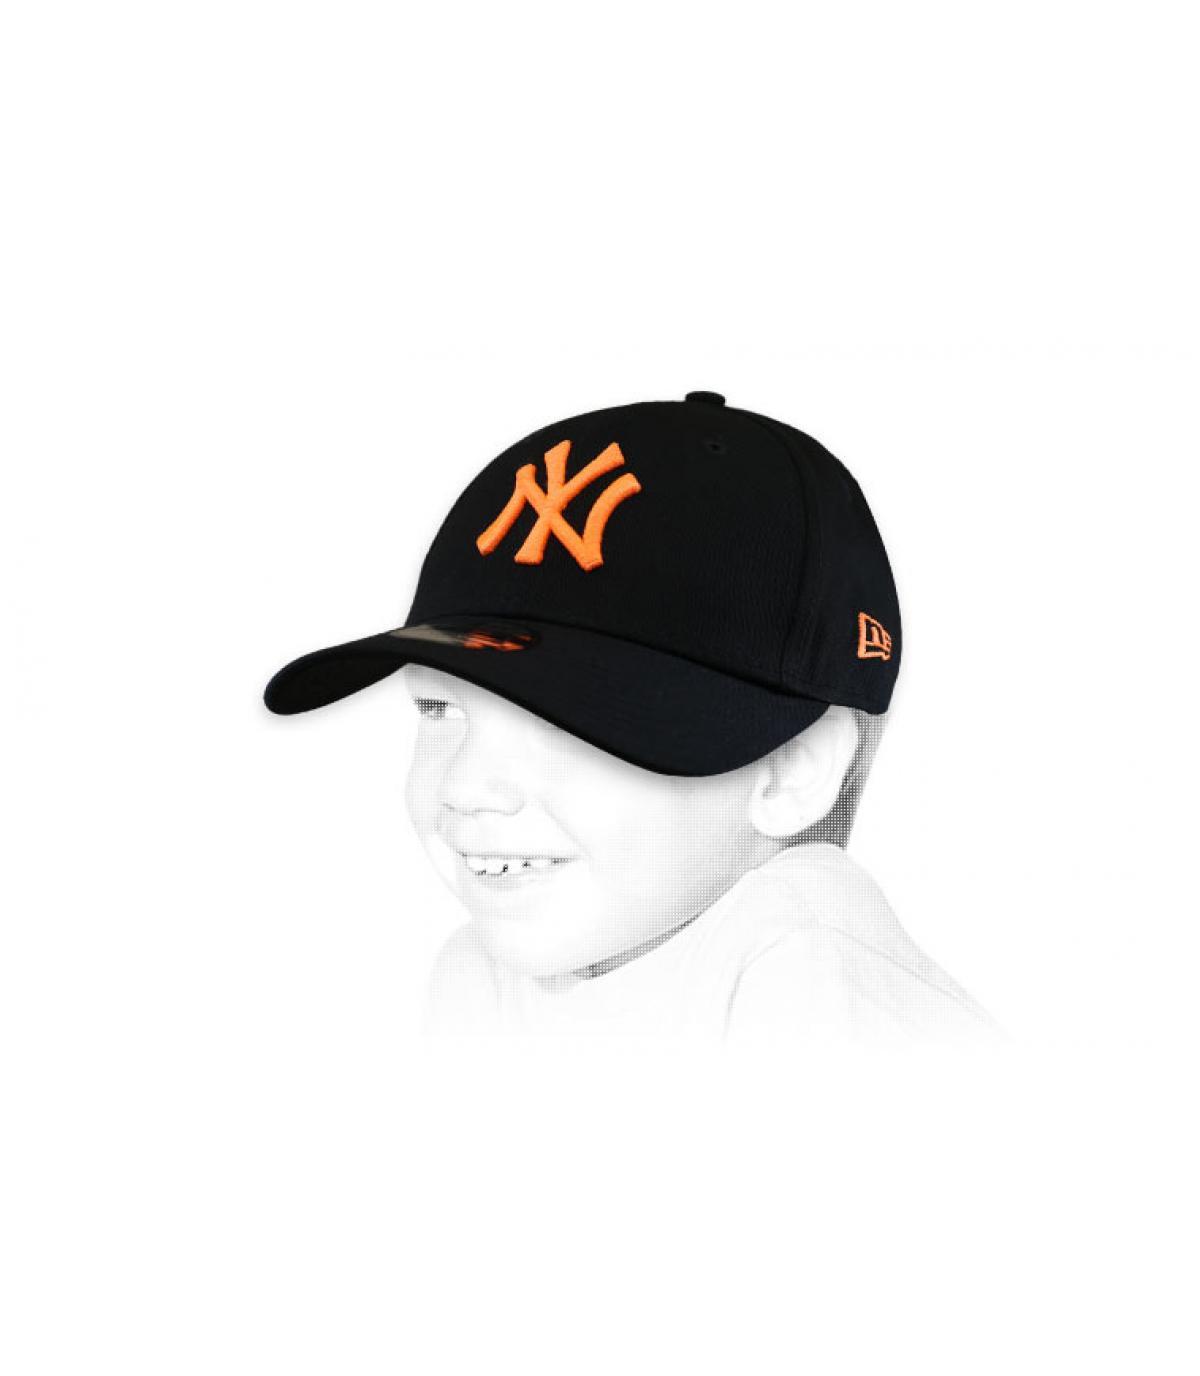 gorra infantil NY negro naranja